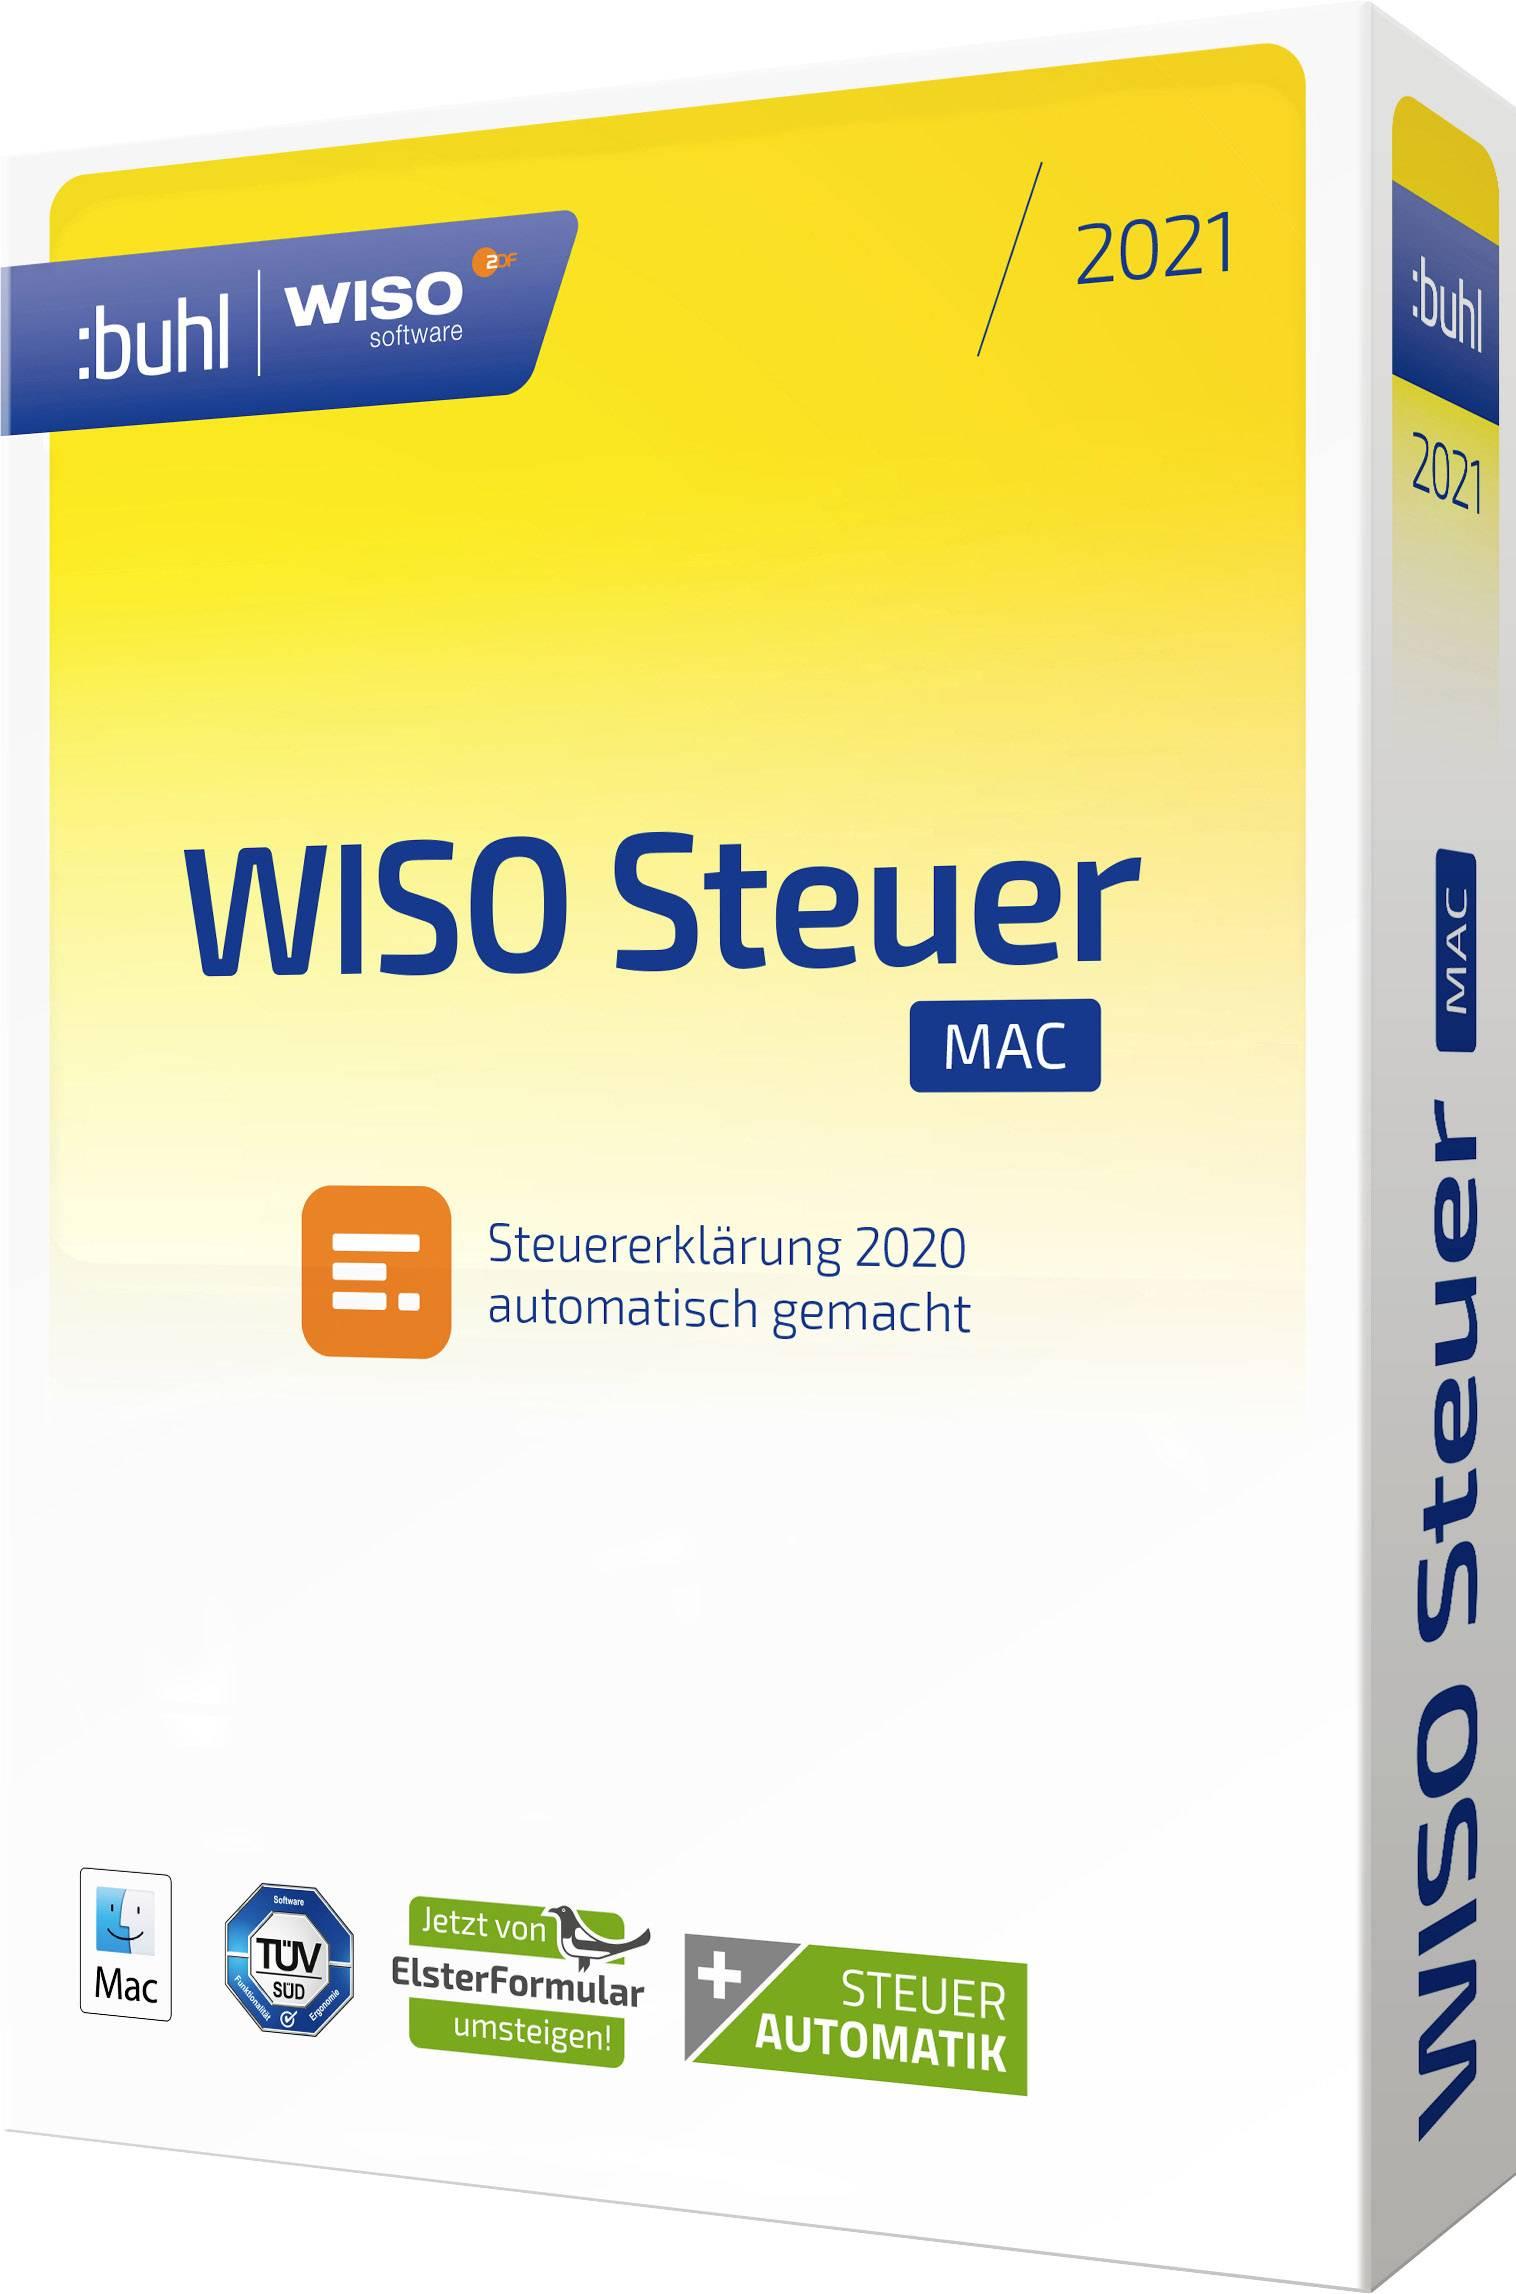 WISO Steuer Mac 2021 Control | Conrad.com